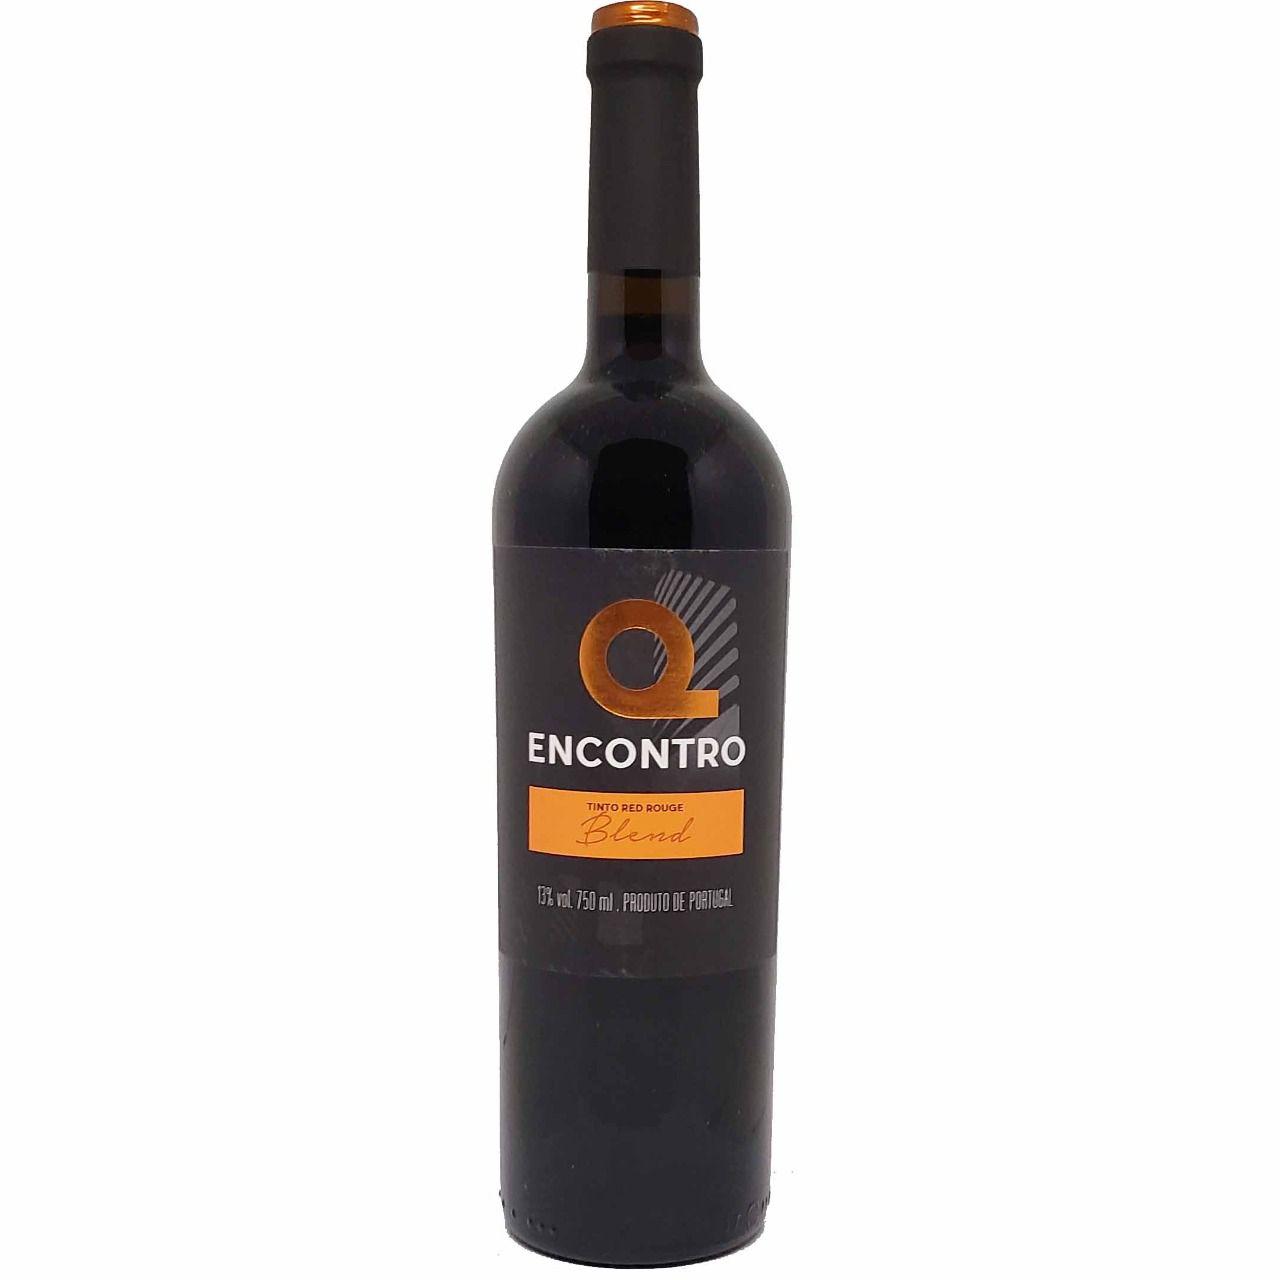 Vinho Tinto Q Encontro Blend - 750ml -